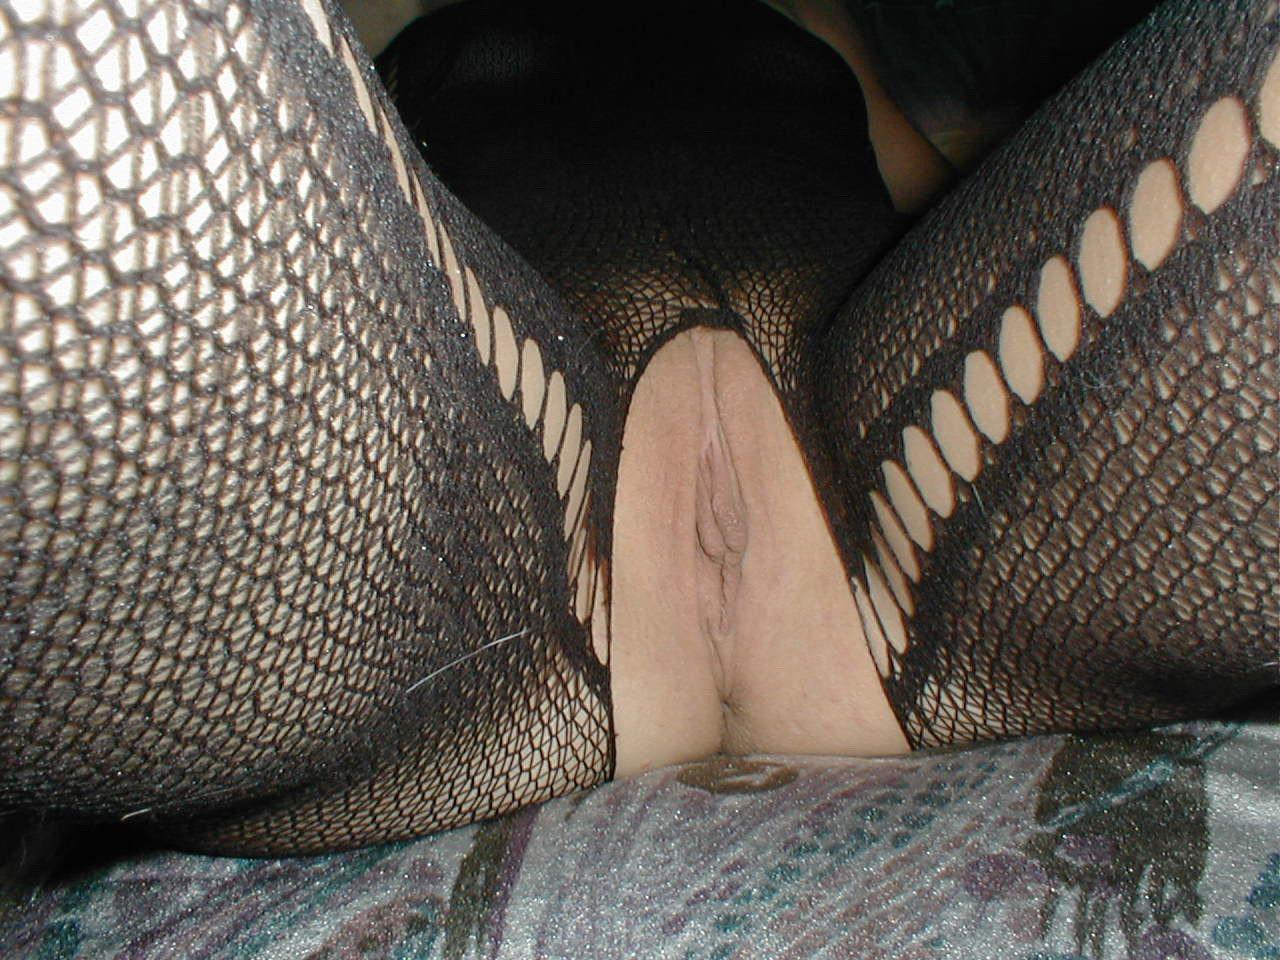 http://pbs-2.adult-empire.com/85/8570/019/pic/5.jpg